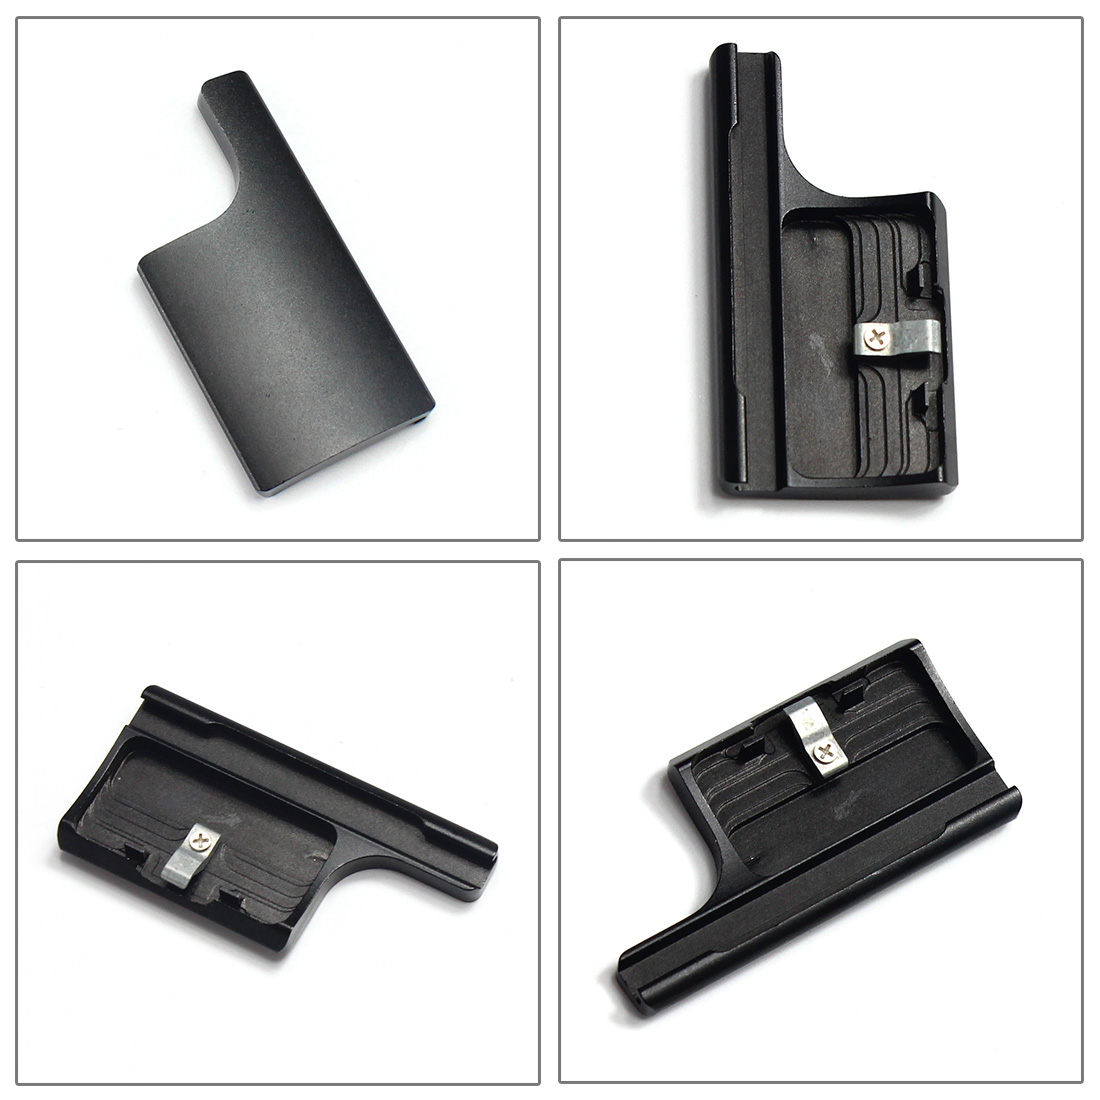 Aluminum Replacement Rear Snap Latch Waterproof Housing Buckle Lock for GoPro Hero 4 3+ black